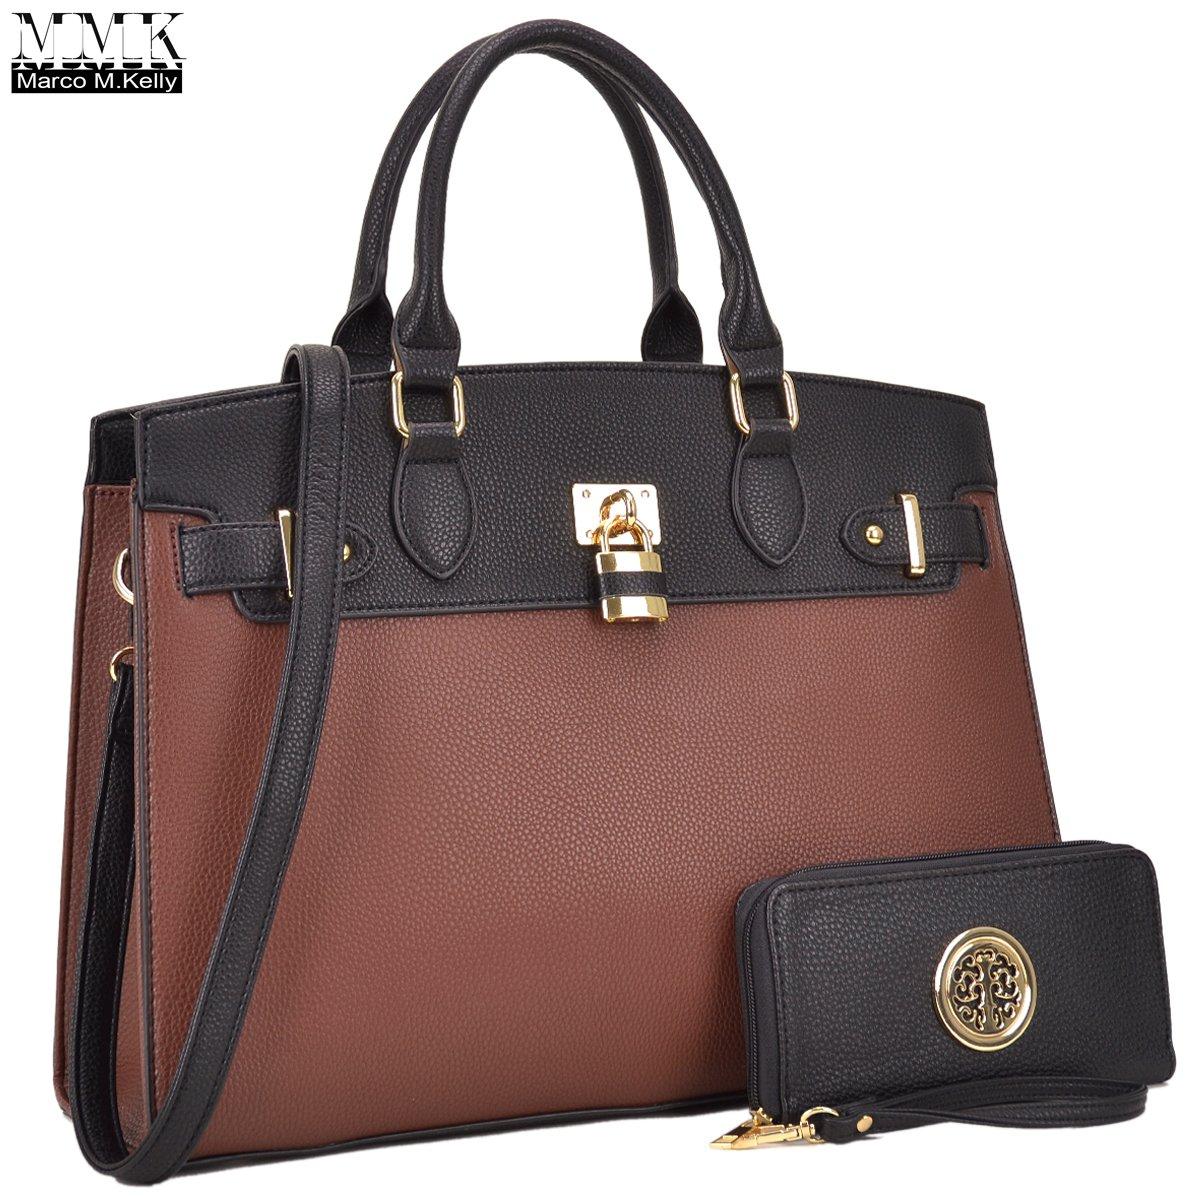 Women Fashion Handbag with Matching wallet~Classic Women Satchel Tote Bag Shoulder Bags~Signature Women Designer Purse ~ Perfect Women Satchel handbag with Spring color block (03-6876-Black/Brown)